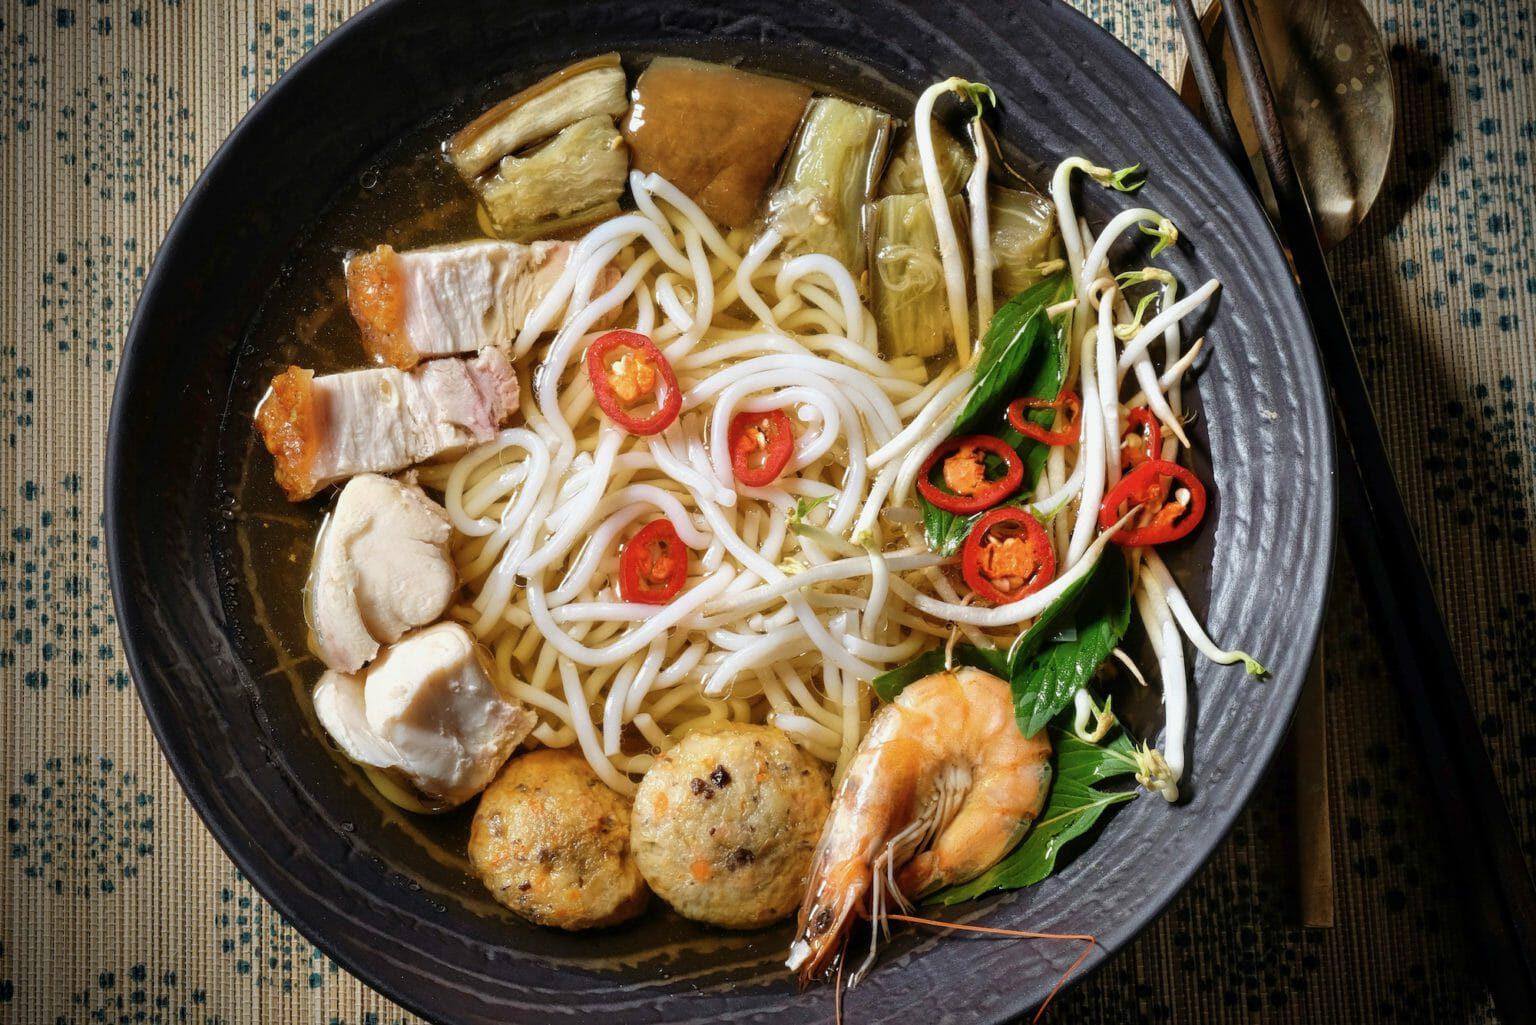 fermented-fish-consomme-bun-mam